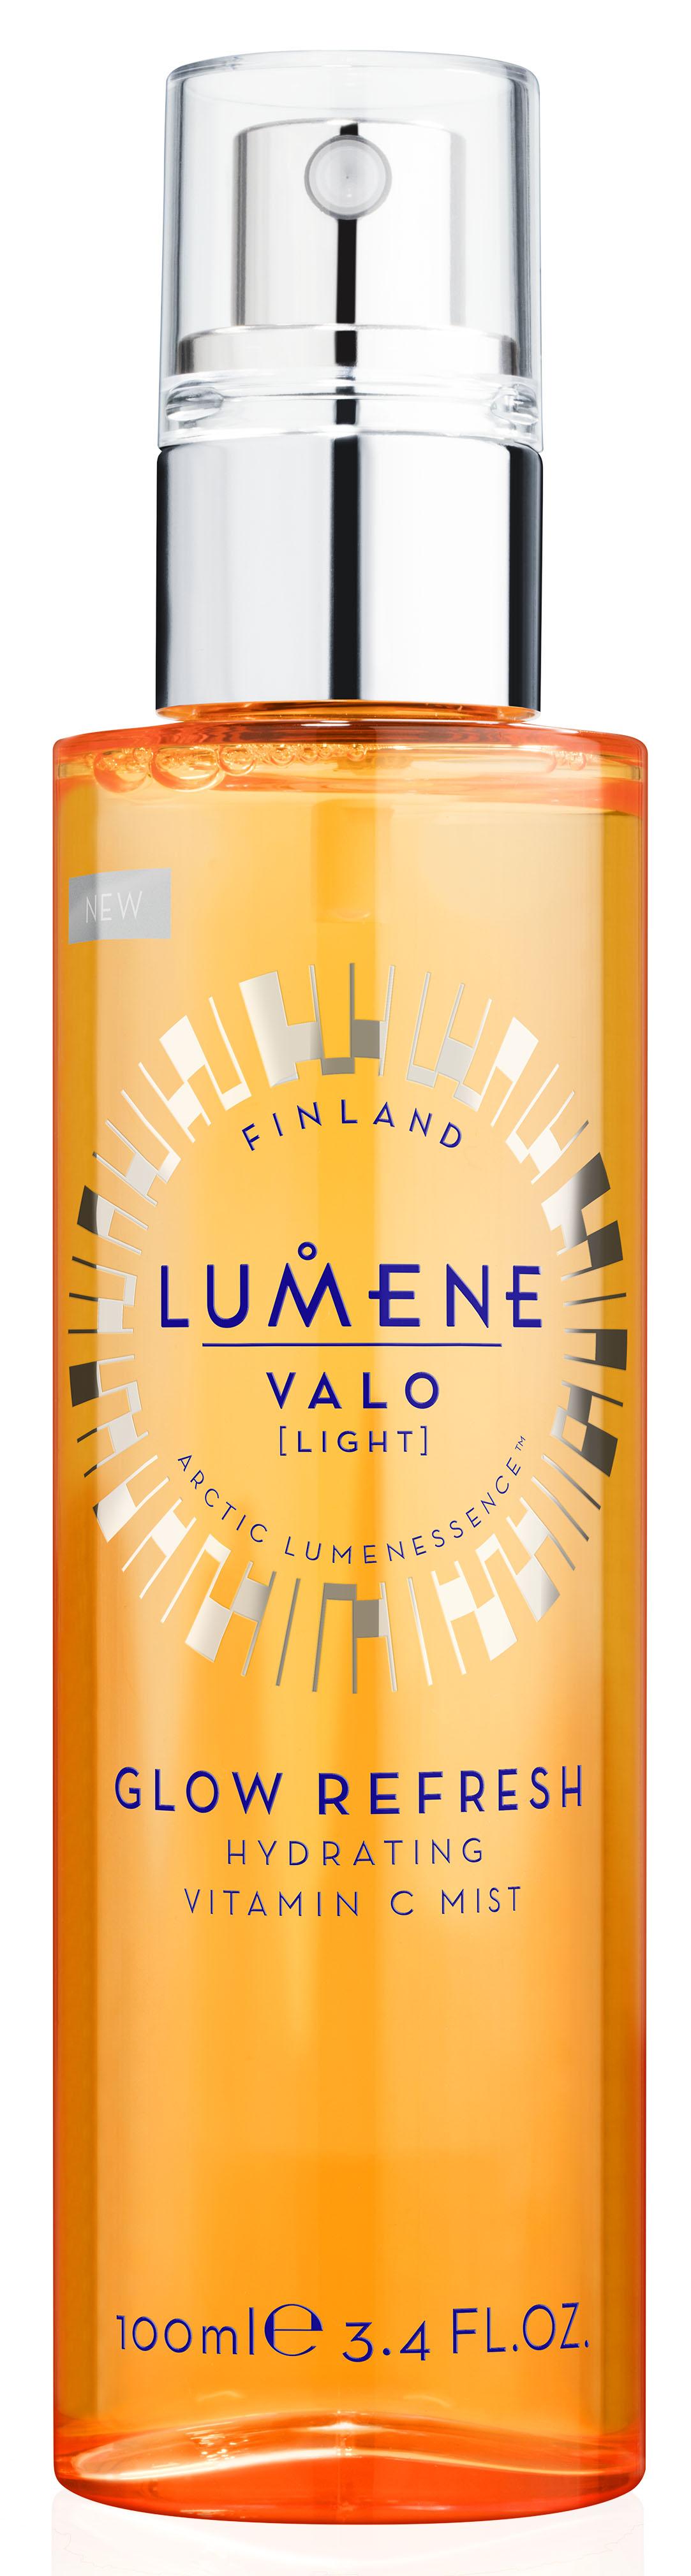 Lumene Valo Увлажняющая освежающая дымка для лица Vitamin C, 100 мл lumene valo дневной крем spf 15 vitamin c 50 мл